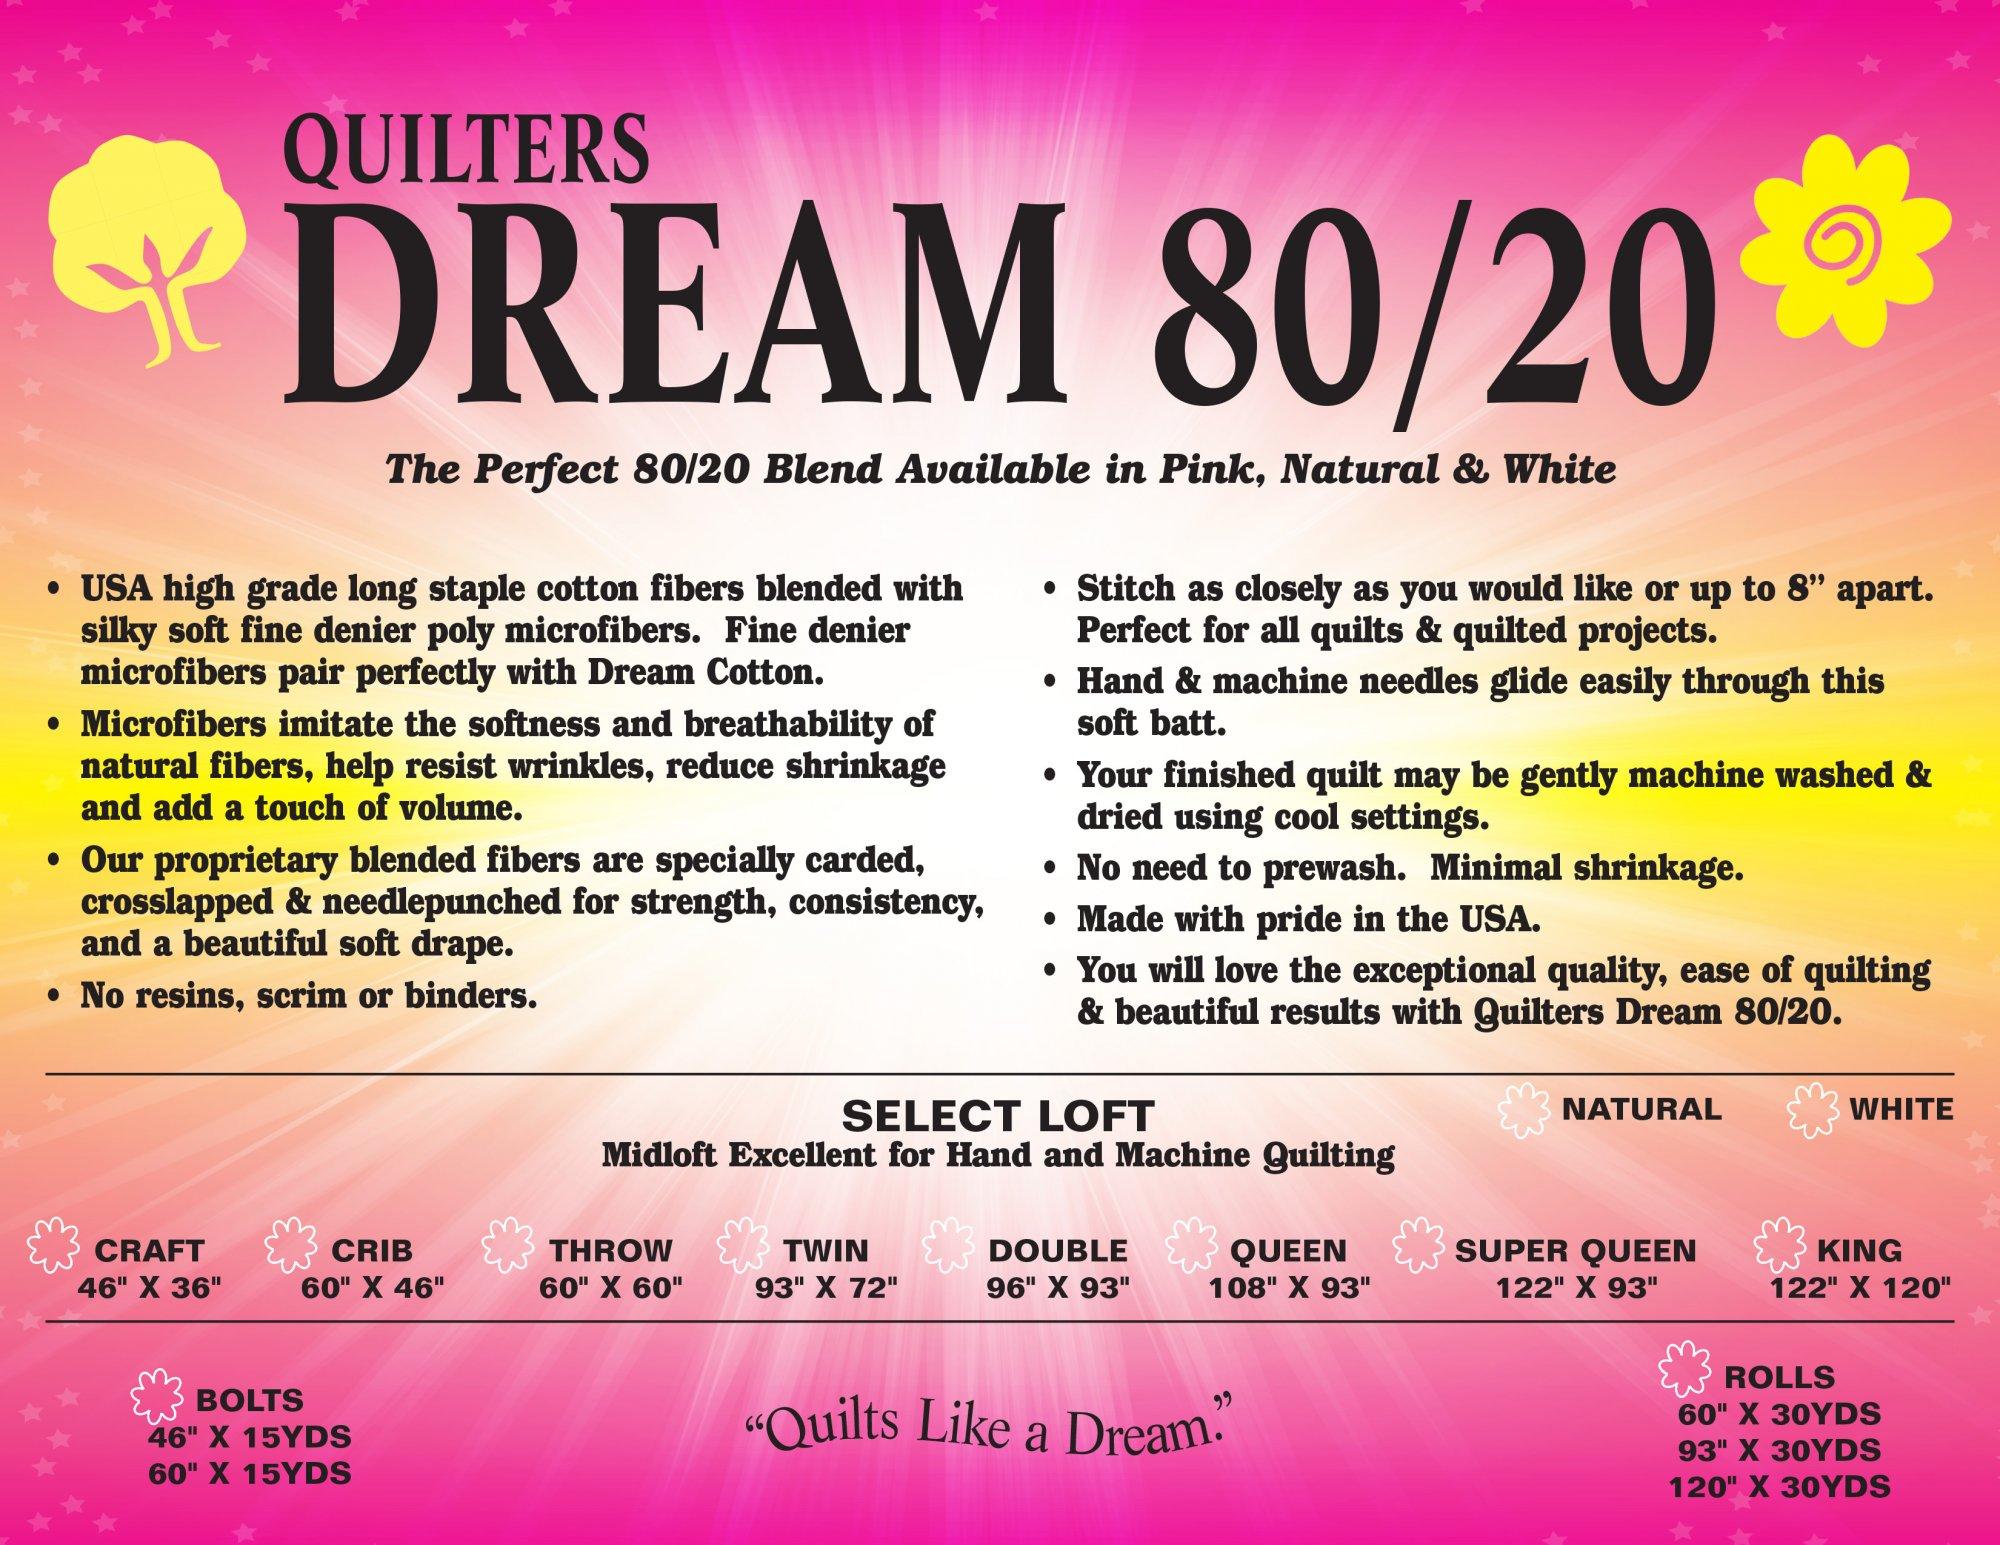 Dream 80/20 Natural Craft 46 x 36